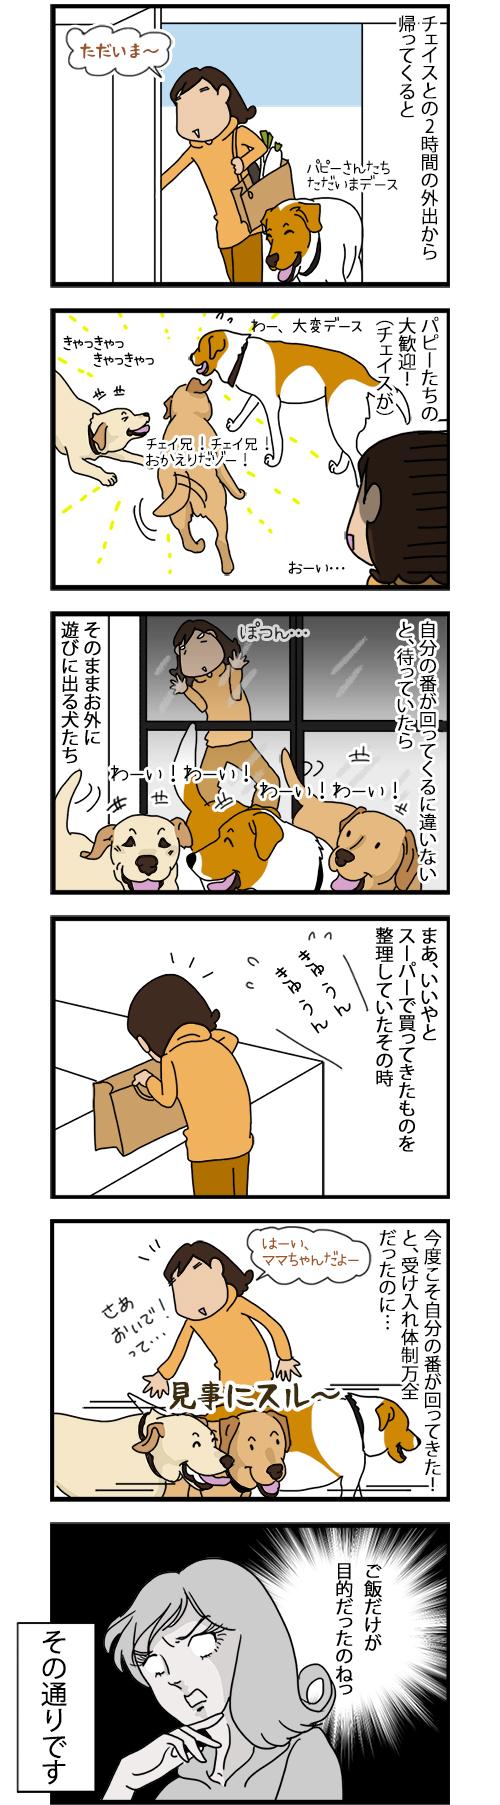 30052020_dogcomic.jpg